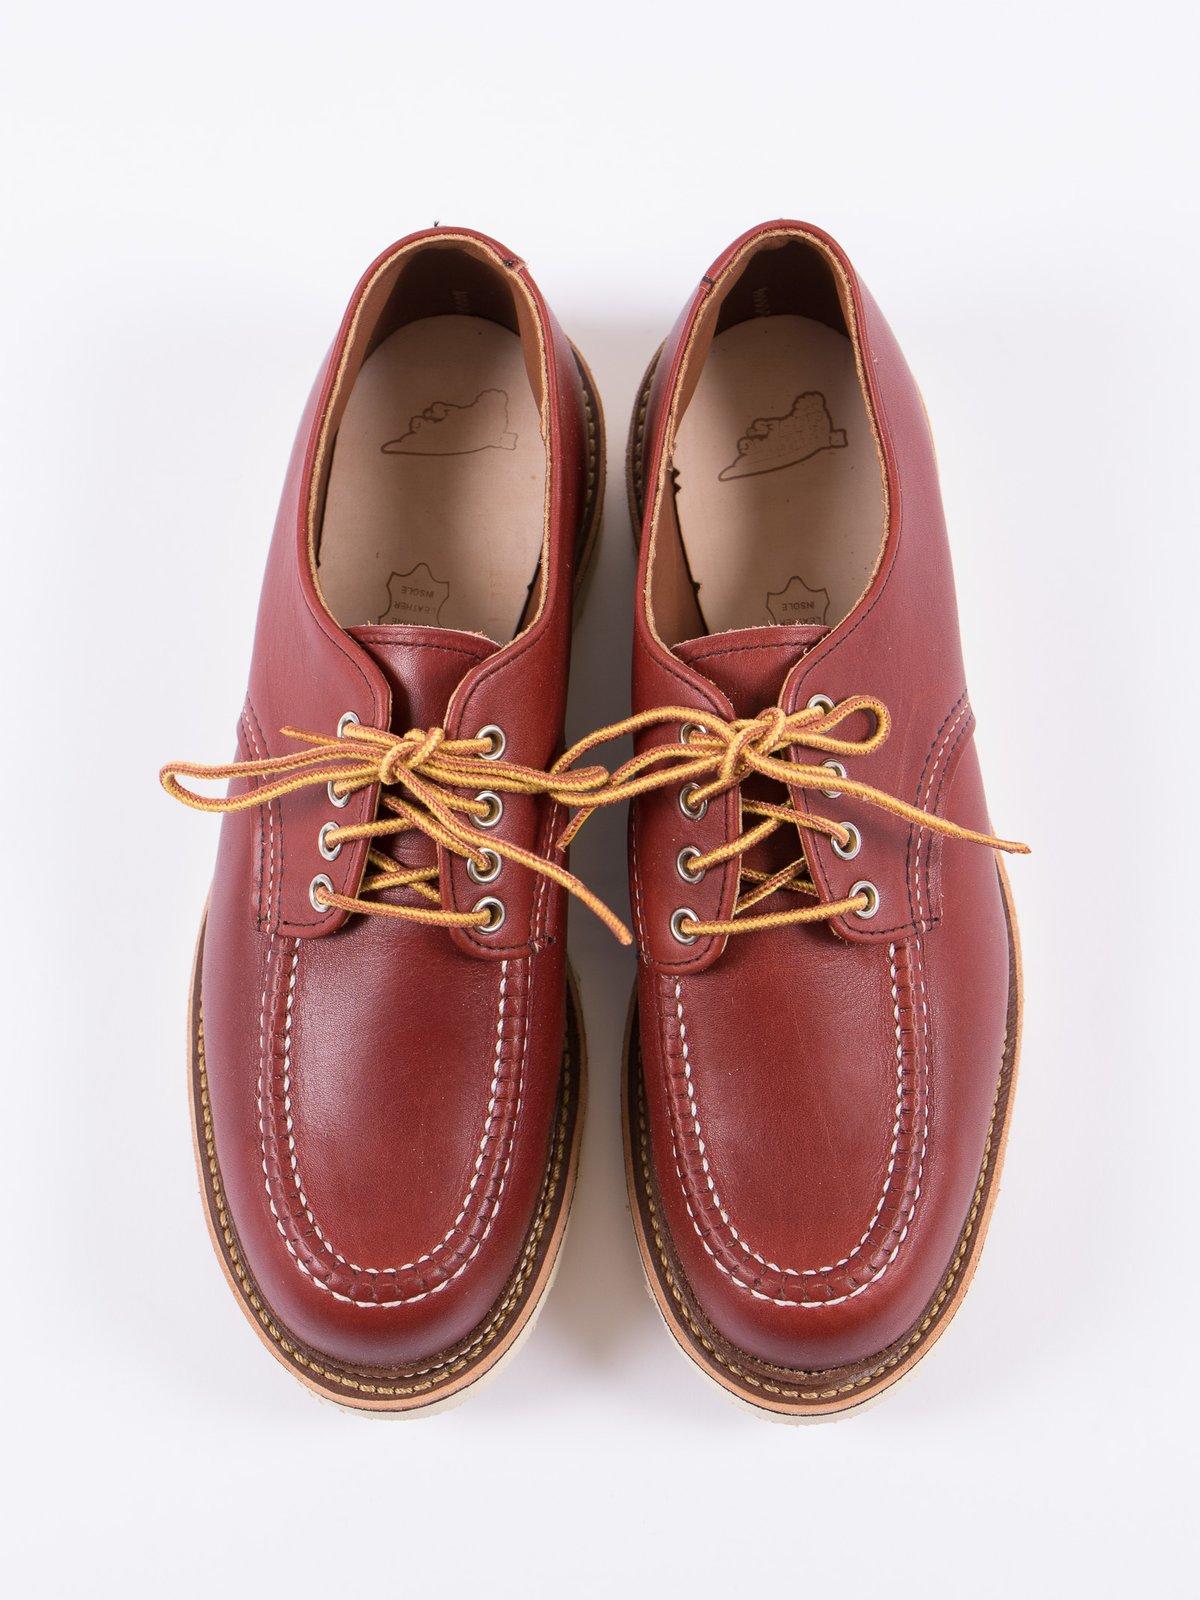 Oro Russet Portage 8103 Classic Oxford Shoe - Image 5